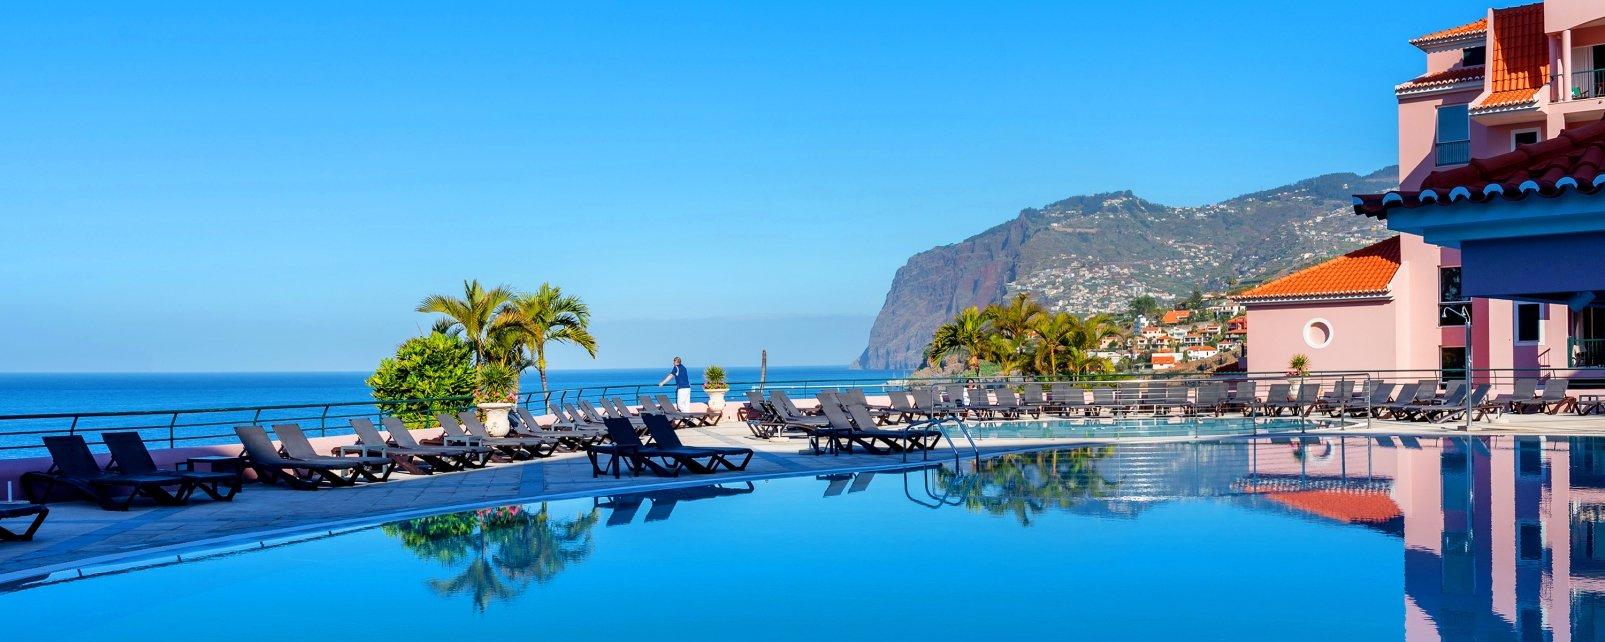 Ôclub Pestana Royal Premium Ocean & SPA Resort